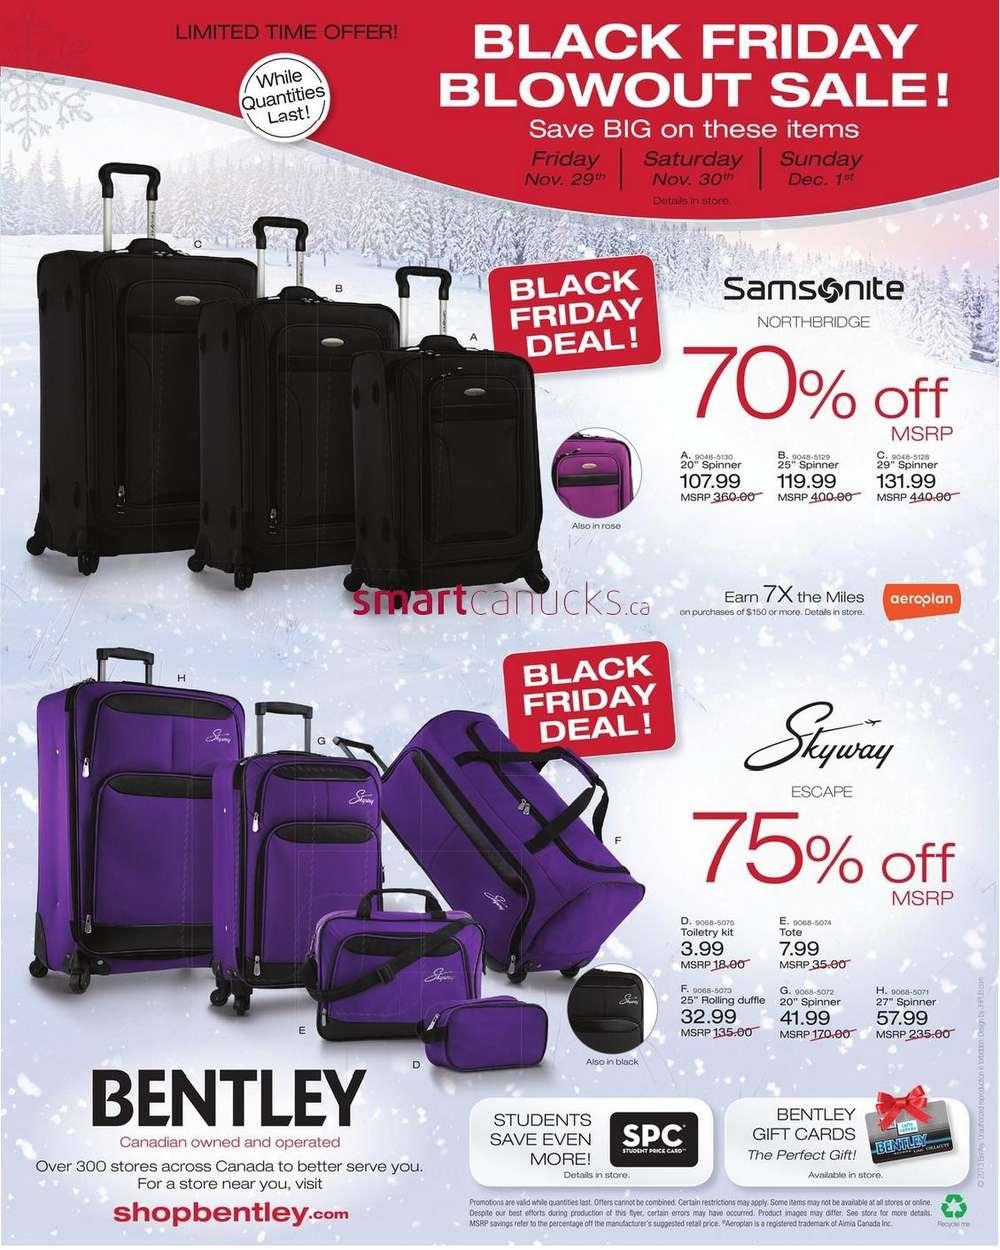 Bentley Black Friday Deals November 29 To December 1